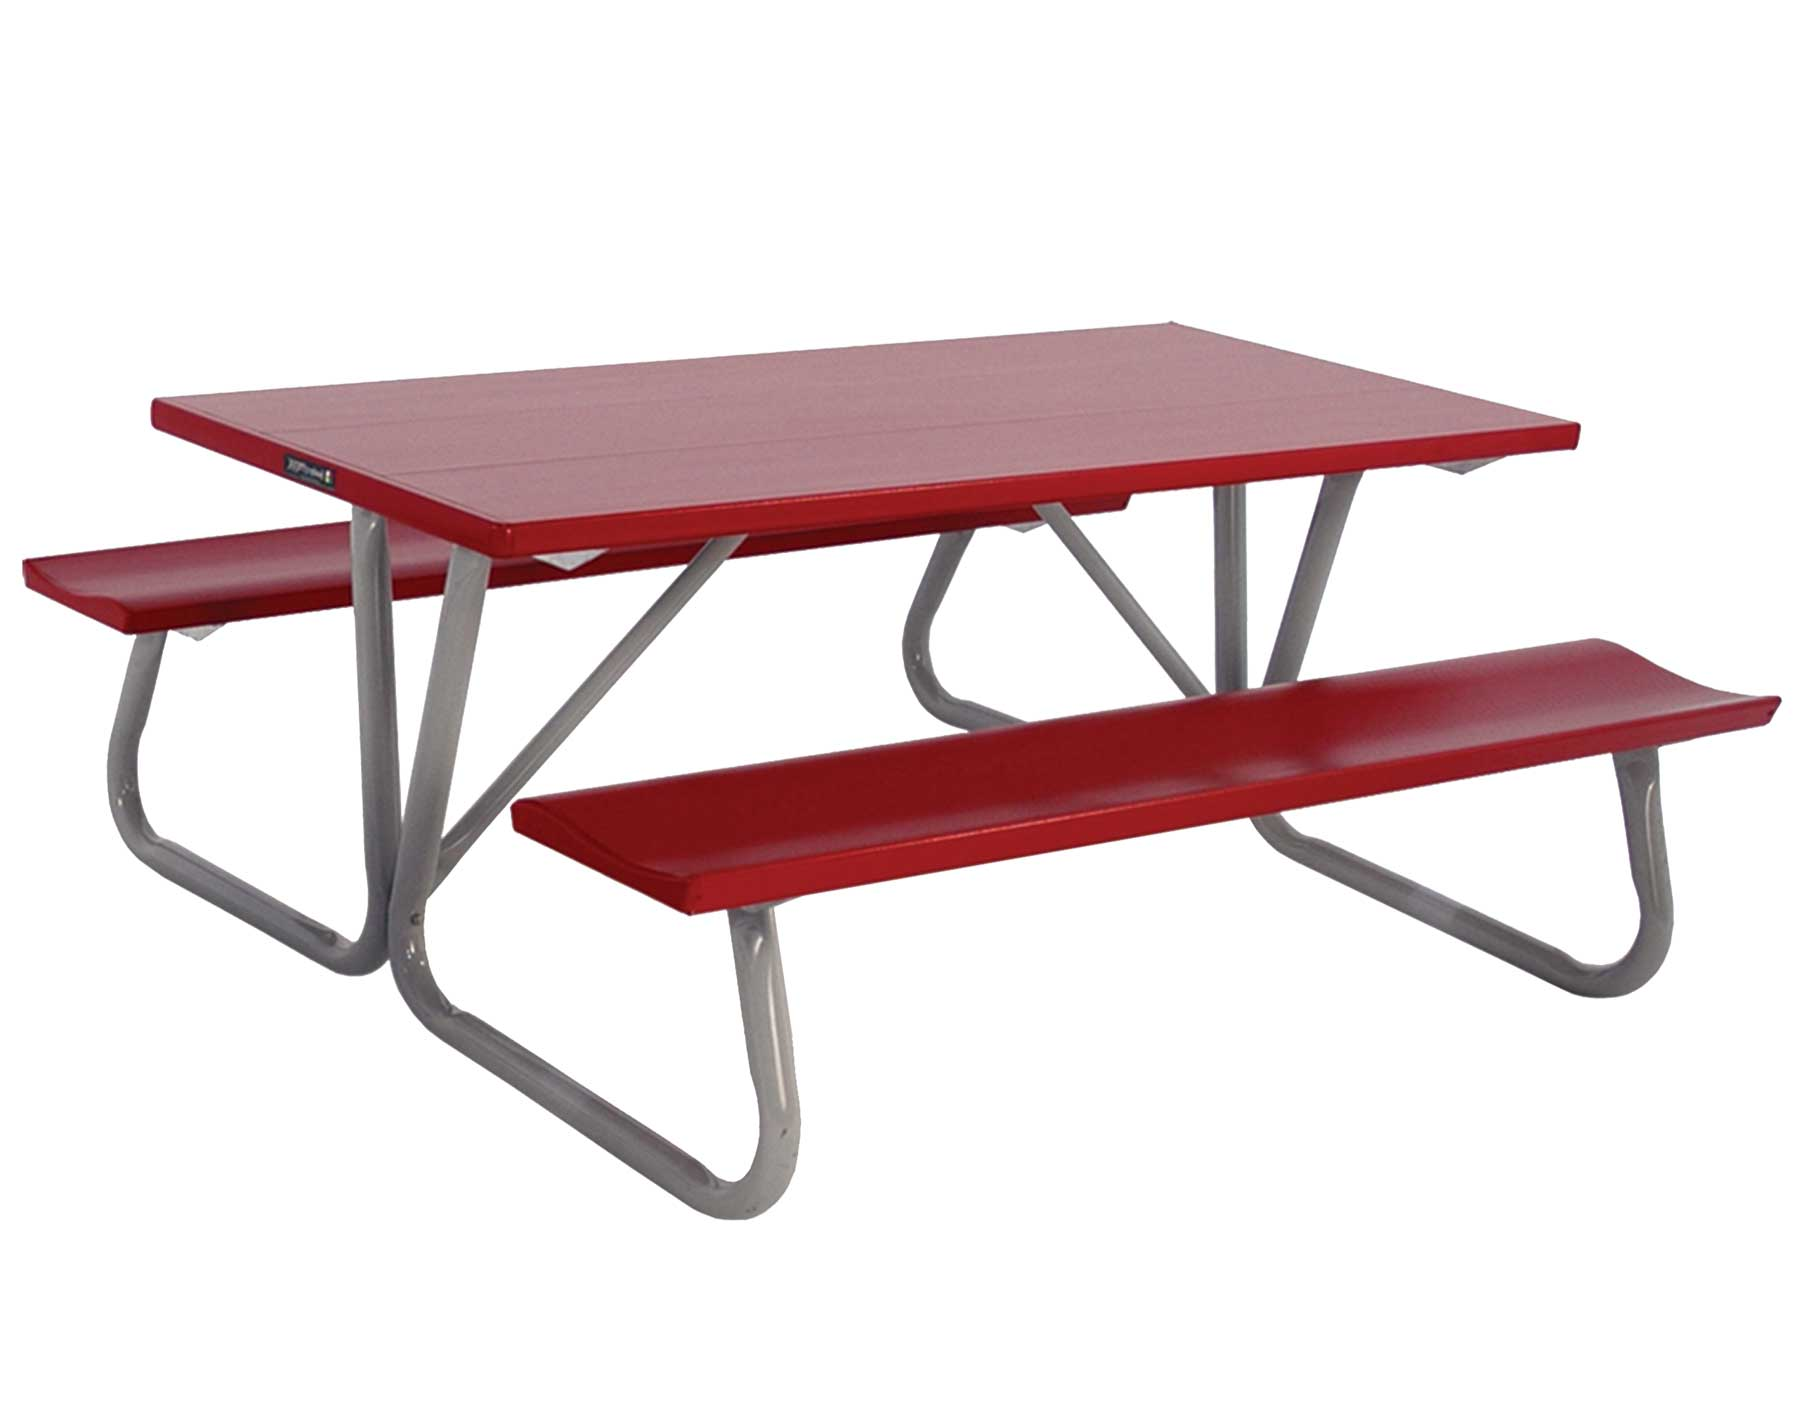 table picnic. Black Bedroom Furniture Sets. Home Design Ideas